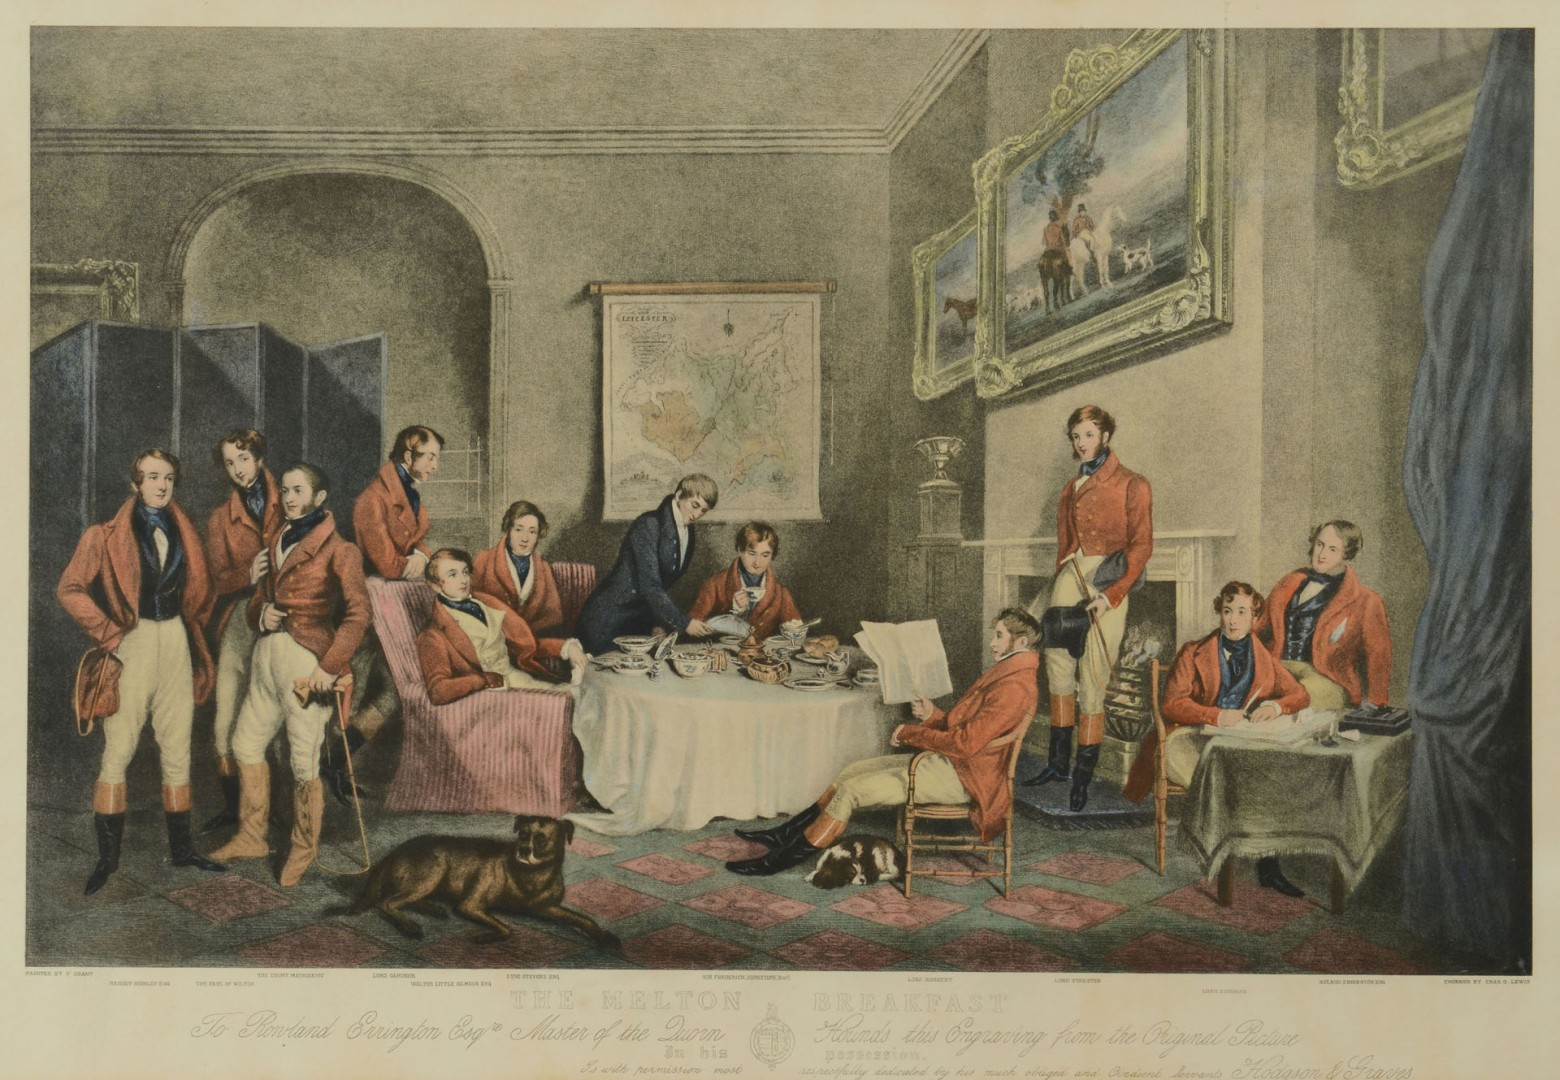 Lot 701: Pair of English Hunting Prints, 19th c.